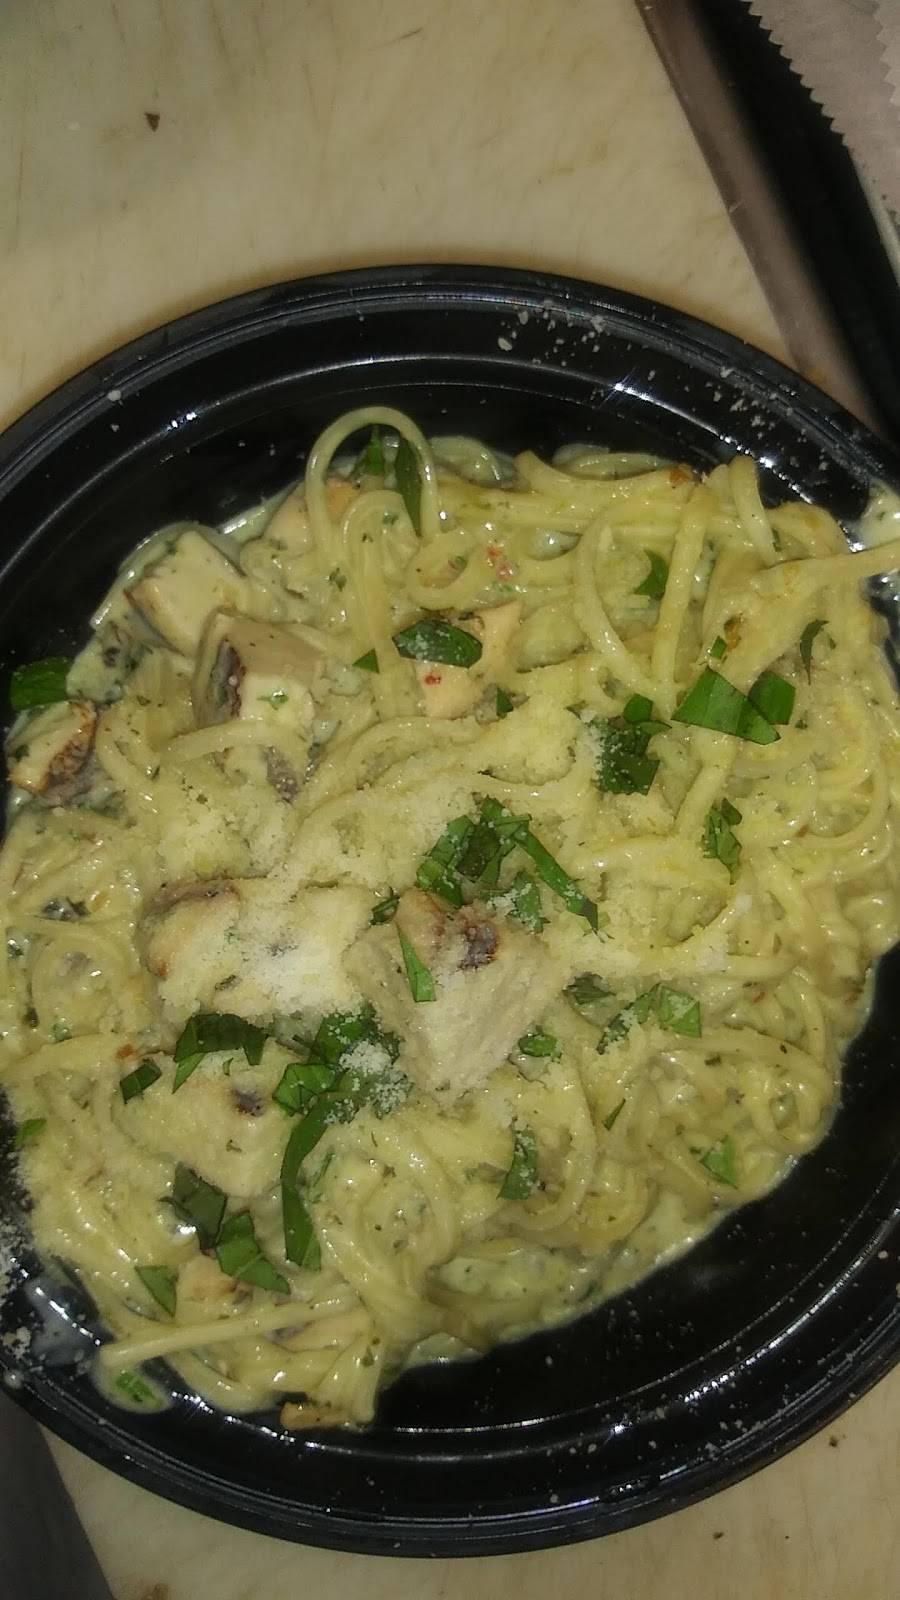 Evergreen Fine Fresh Foods   restaurant   260 Grand Ave, Englewood, NJ 07631, USA   2015411234 OR +1 201-541-1234